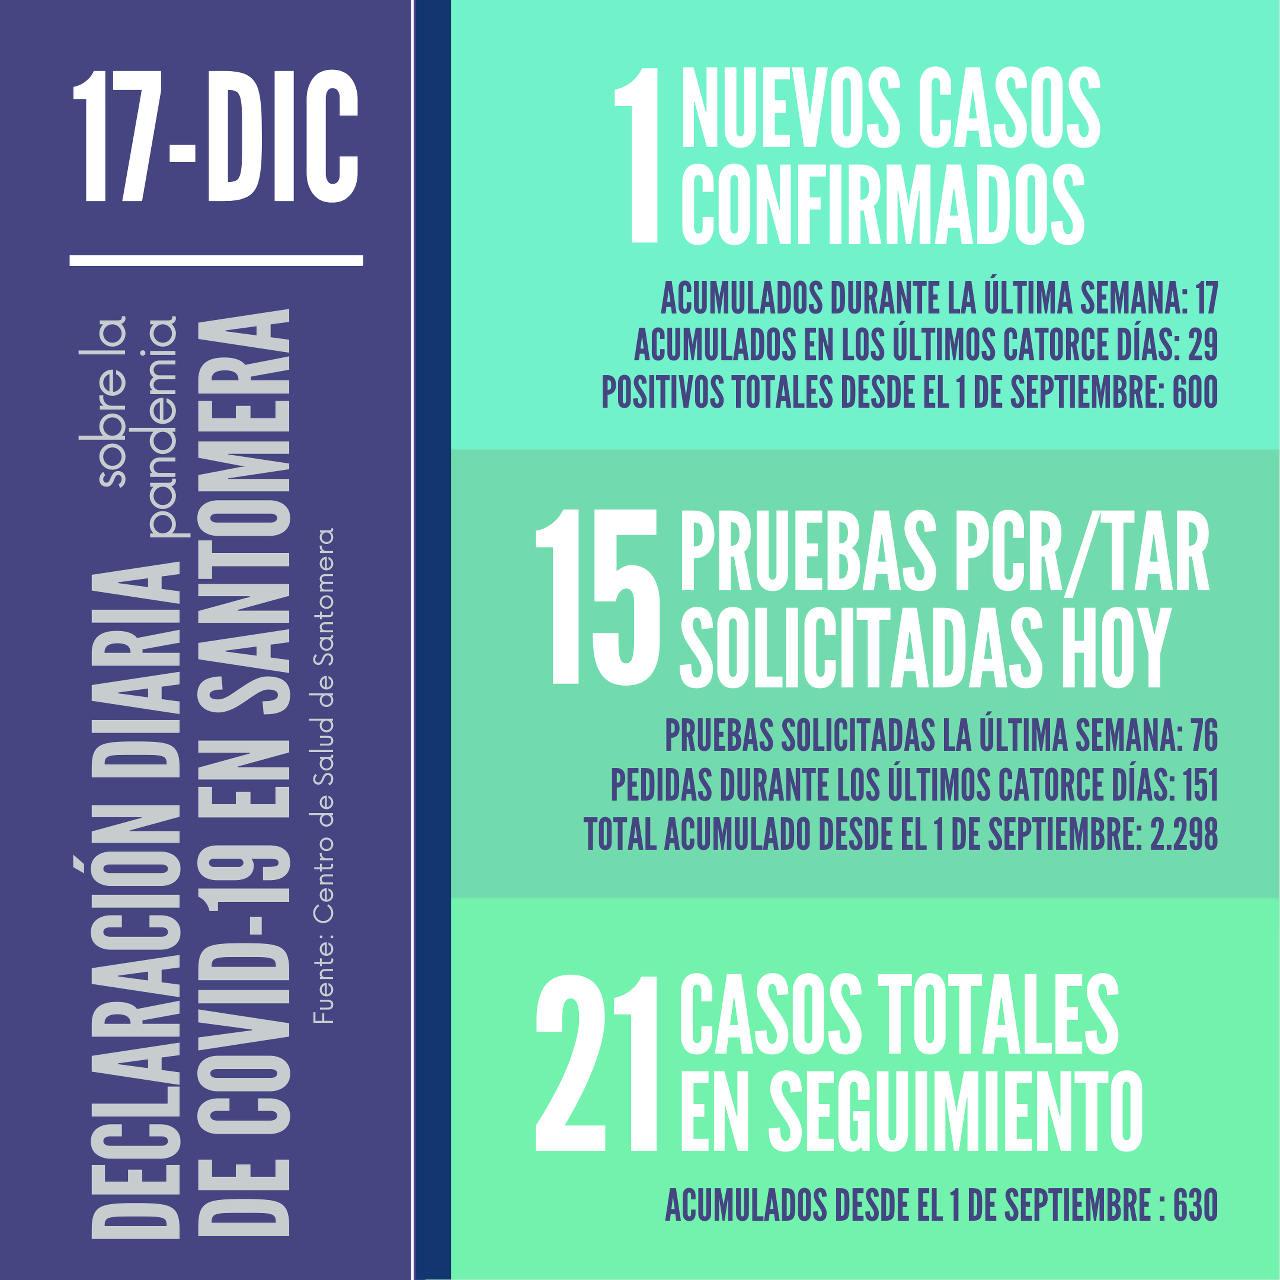 20201217_Datos COVID-19 Santomera